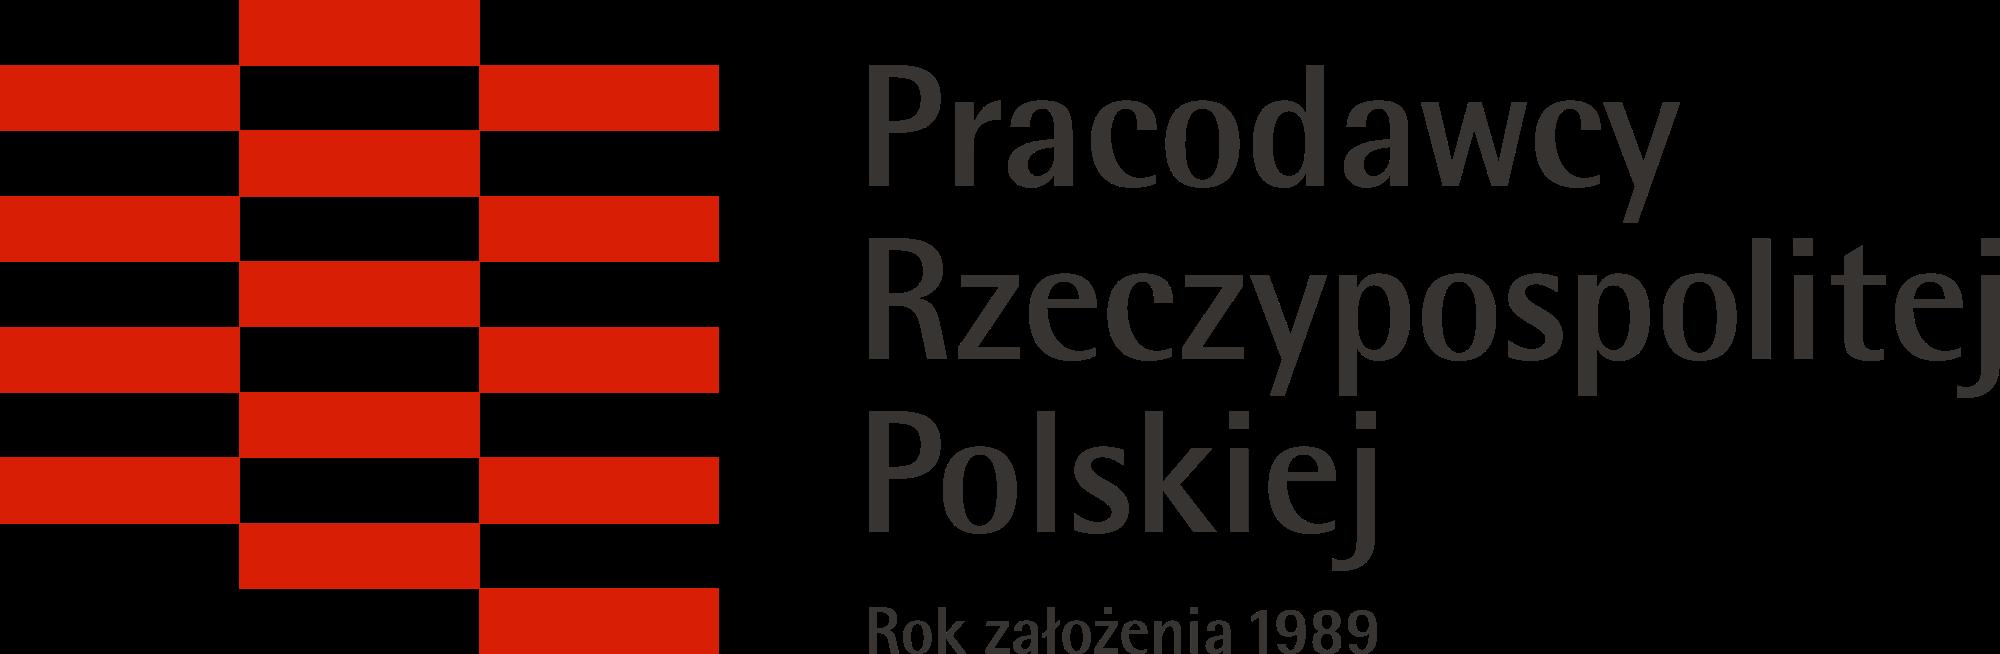 prp_p1_rgb